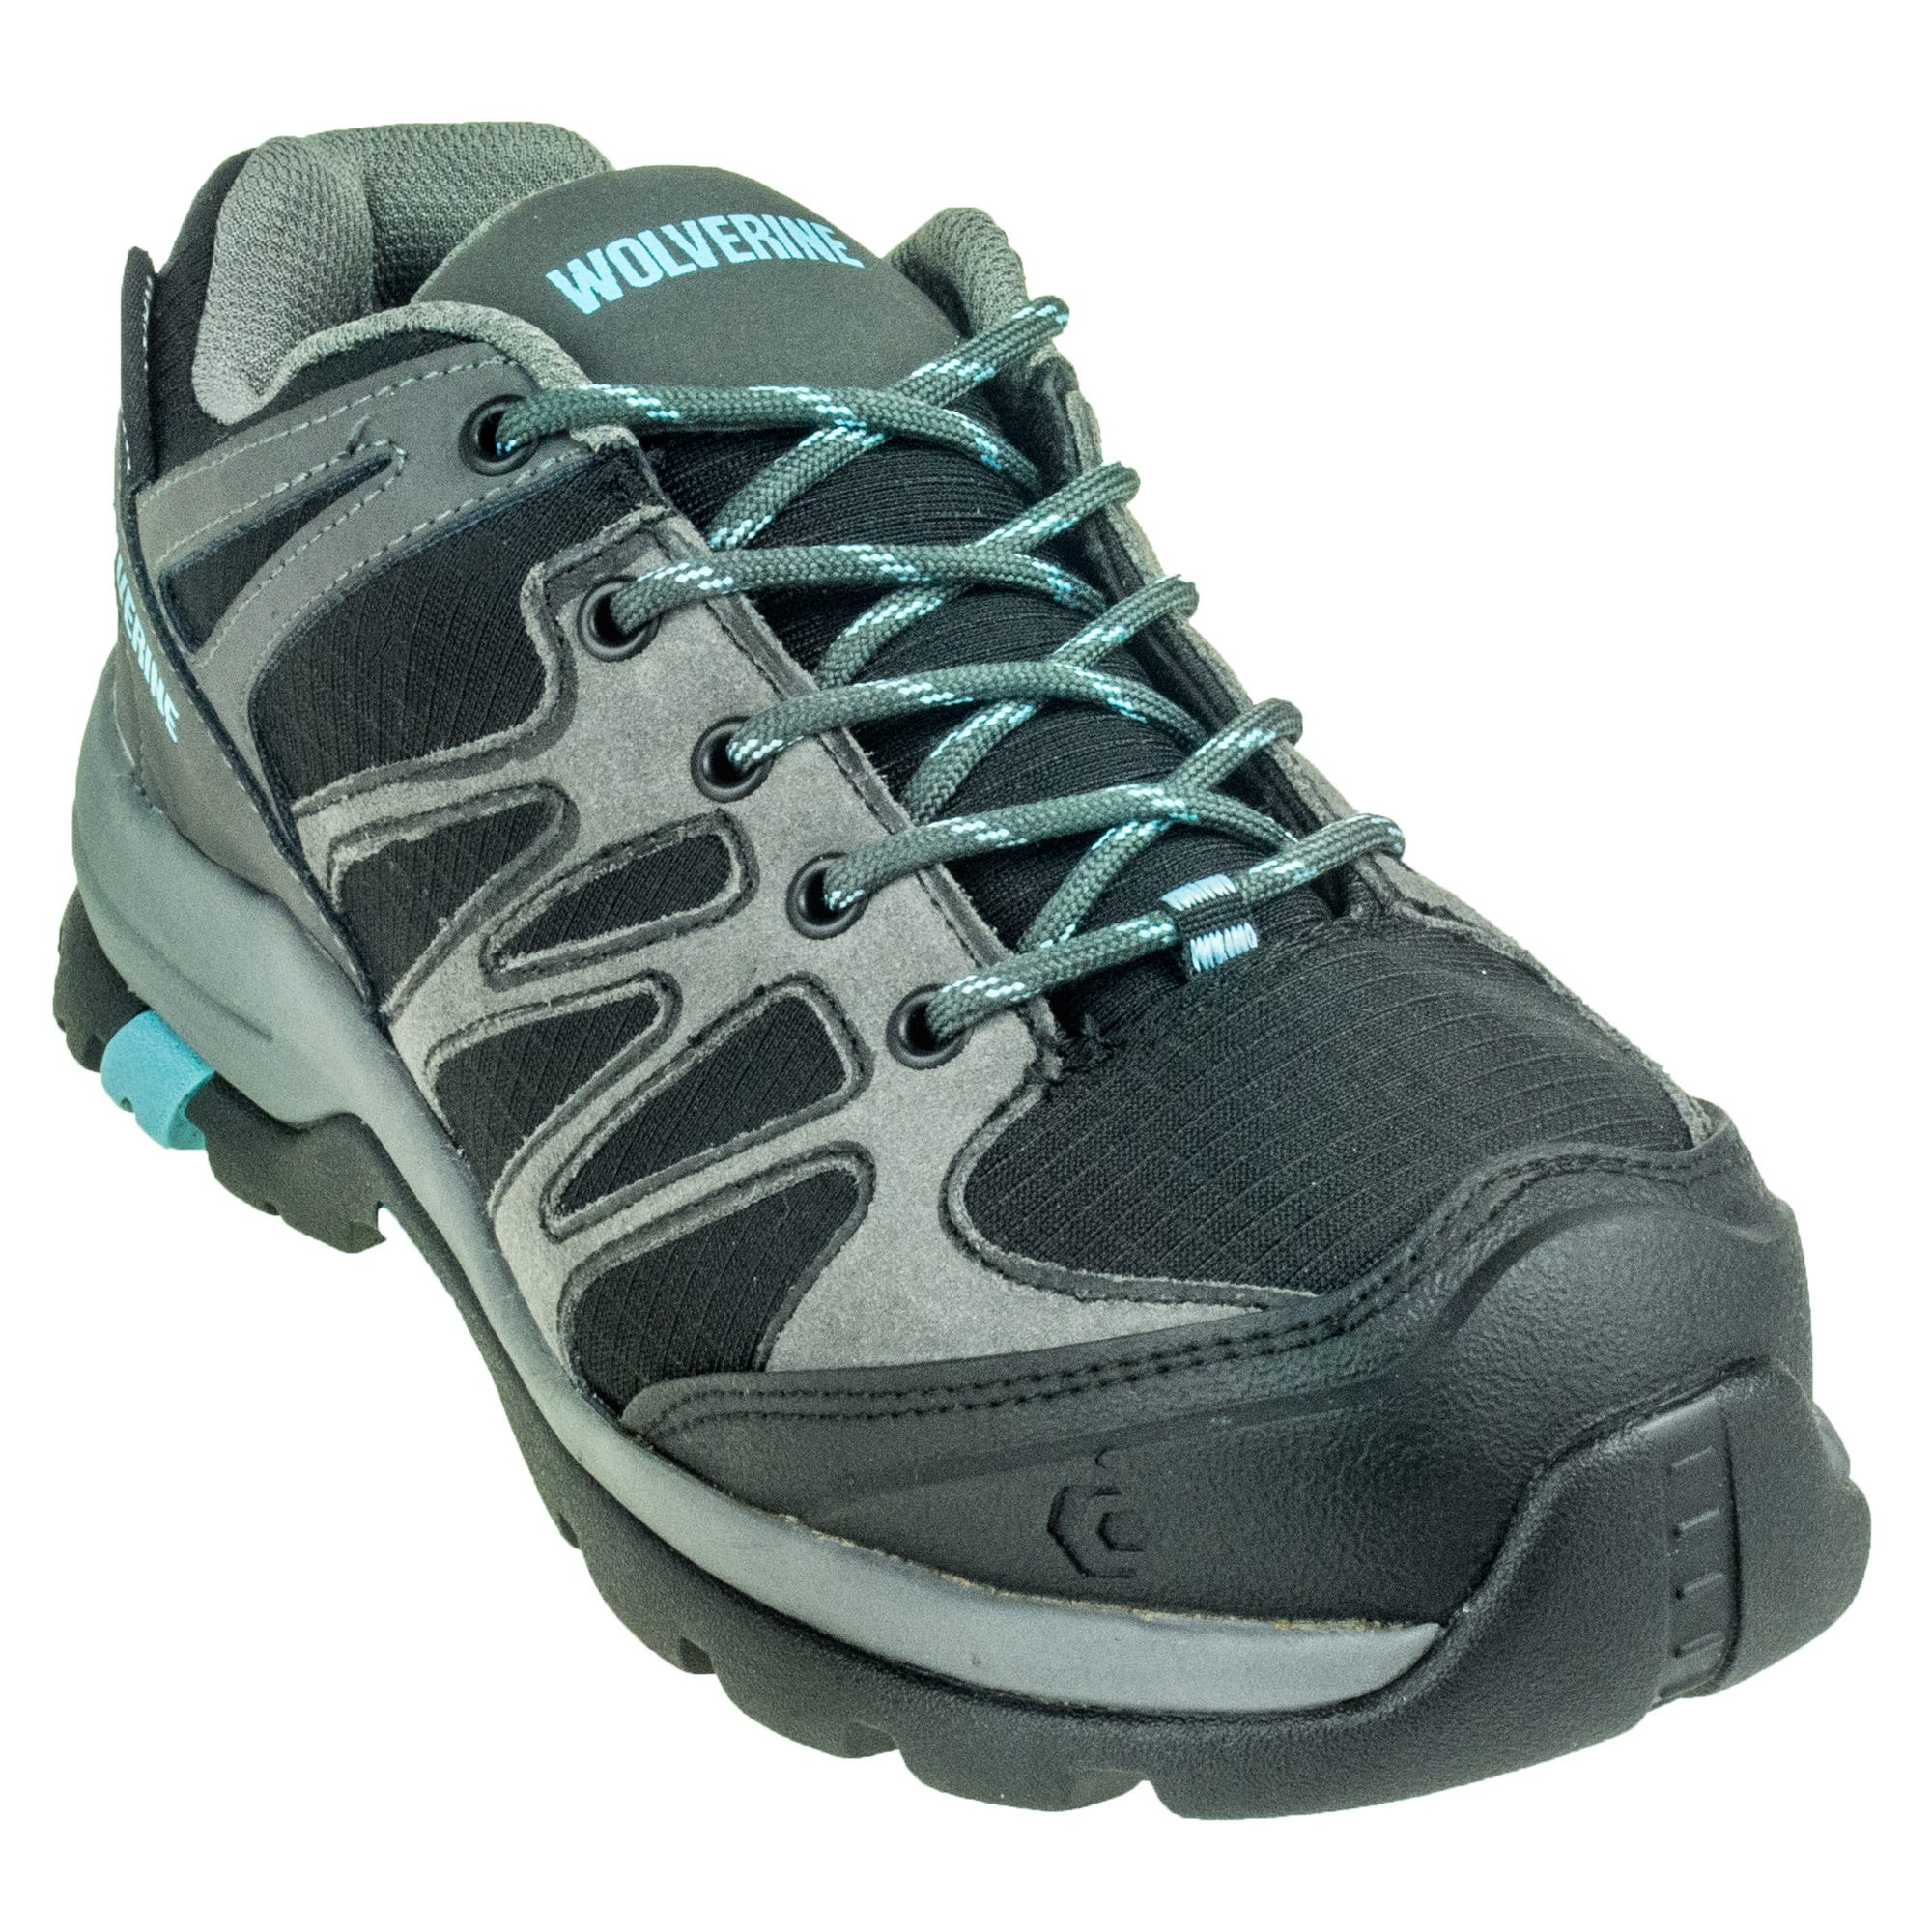 e26ceec946f Wolverine Women s Black Waterproof 10580 Fletcher Composite Toe Work Shoes